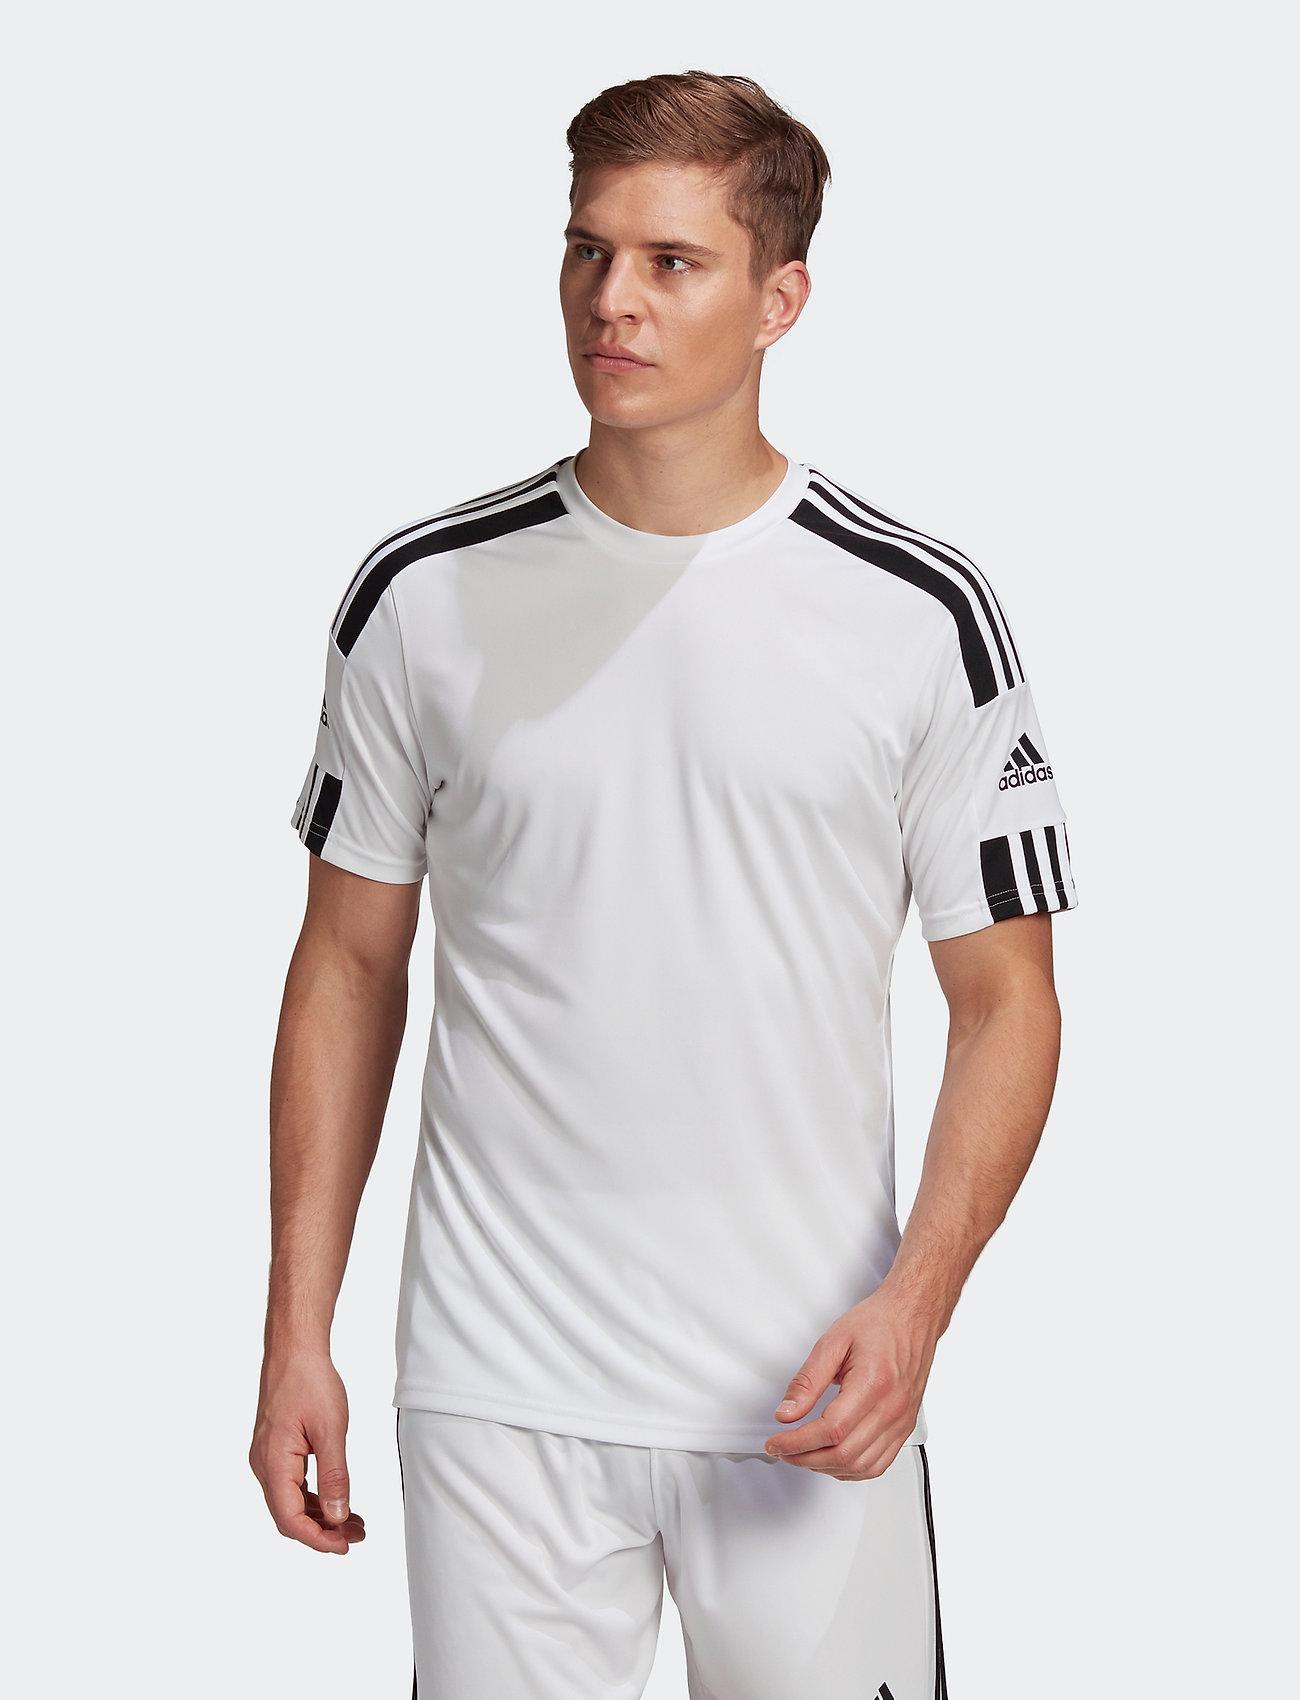 adidas Performance Squadra 21 Jersey - T-Shirts   Boozt.com